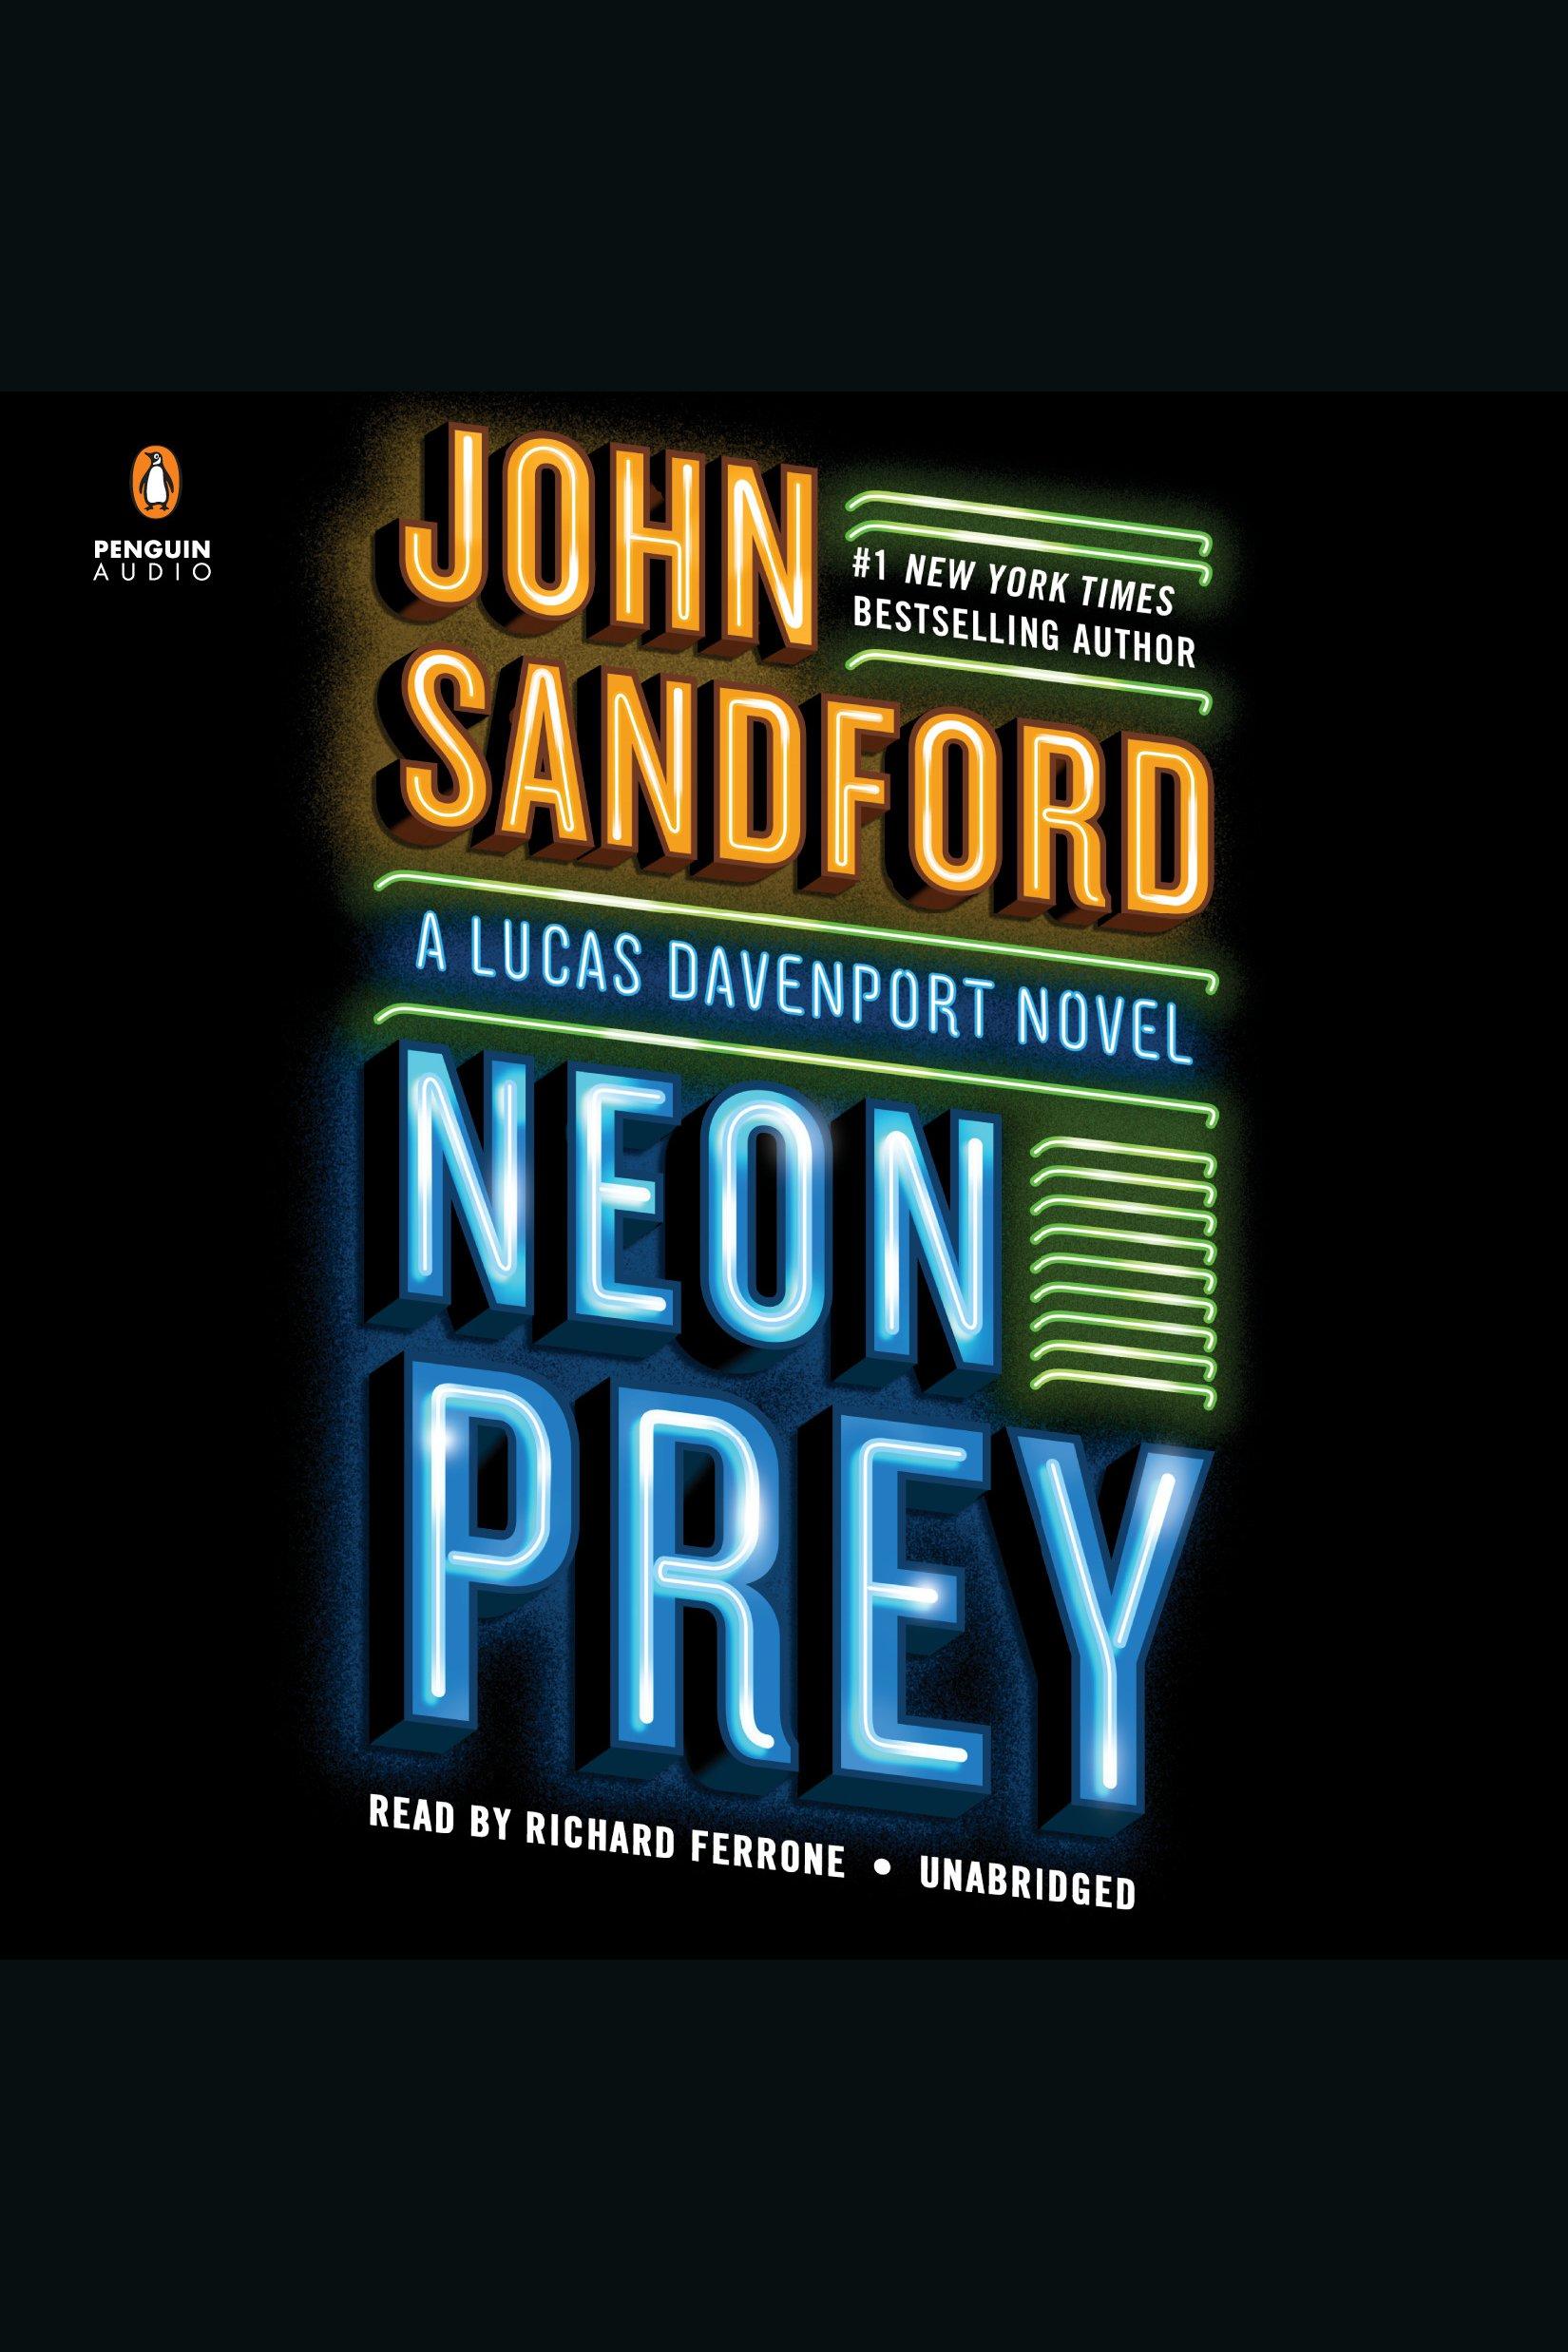 Neon prey cover image